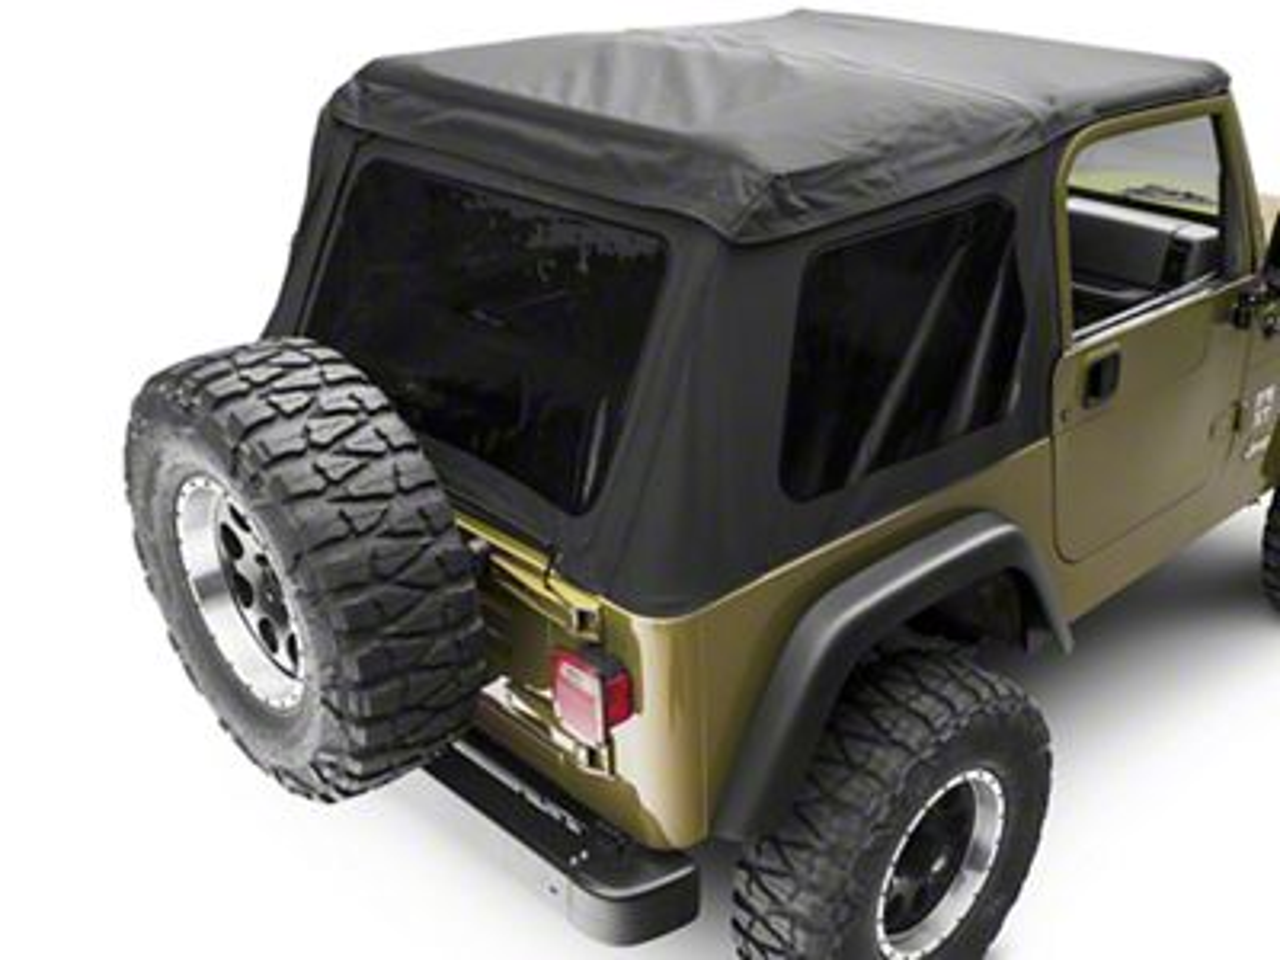 Rugged Ridge Bowless XHD Soft Top w/ Tinted Windows - Black Diamond (97-06 Jeep Wrangler TJ, Excluding Unlimited)